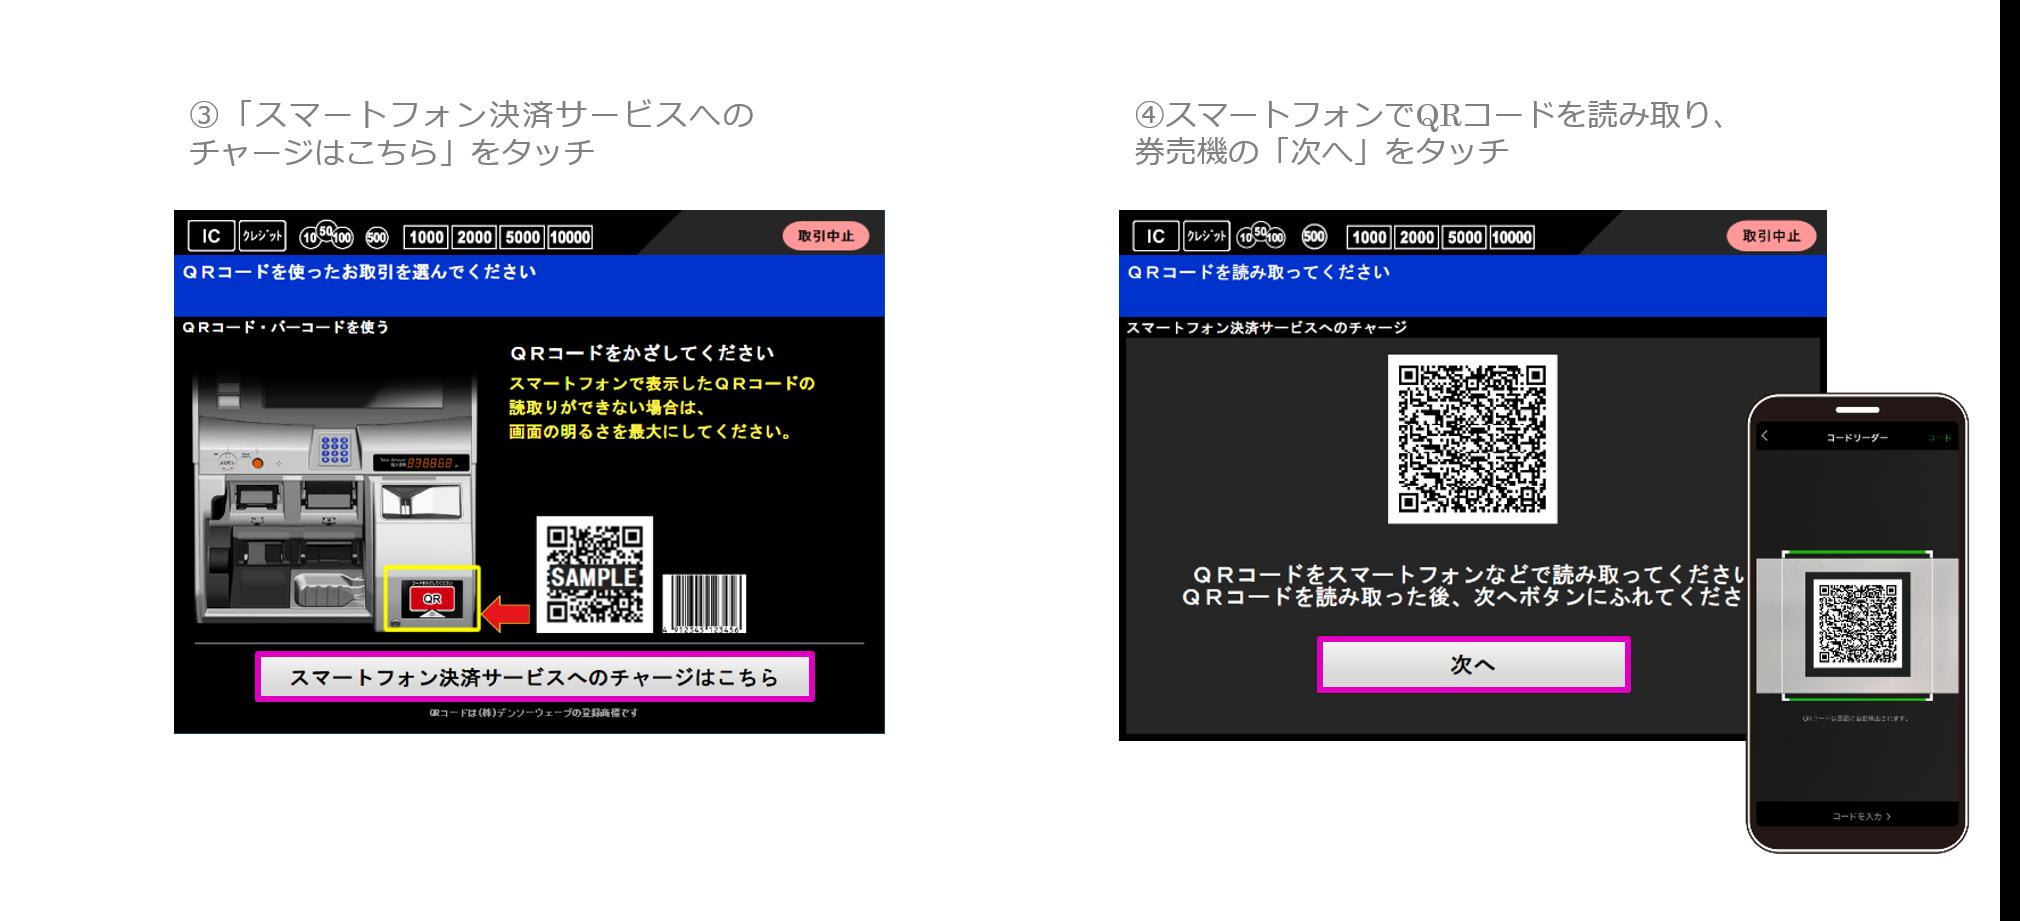 /stf/linecorp/ja/pr/tokyu_3,4.png